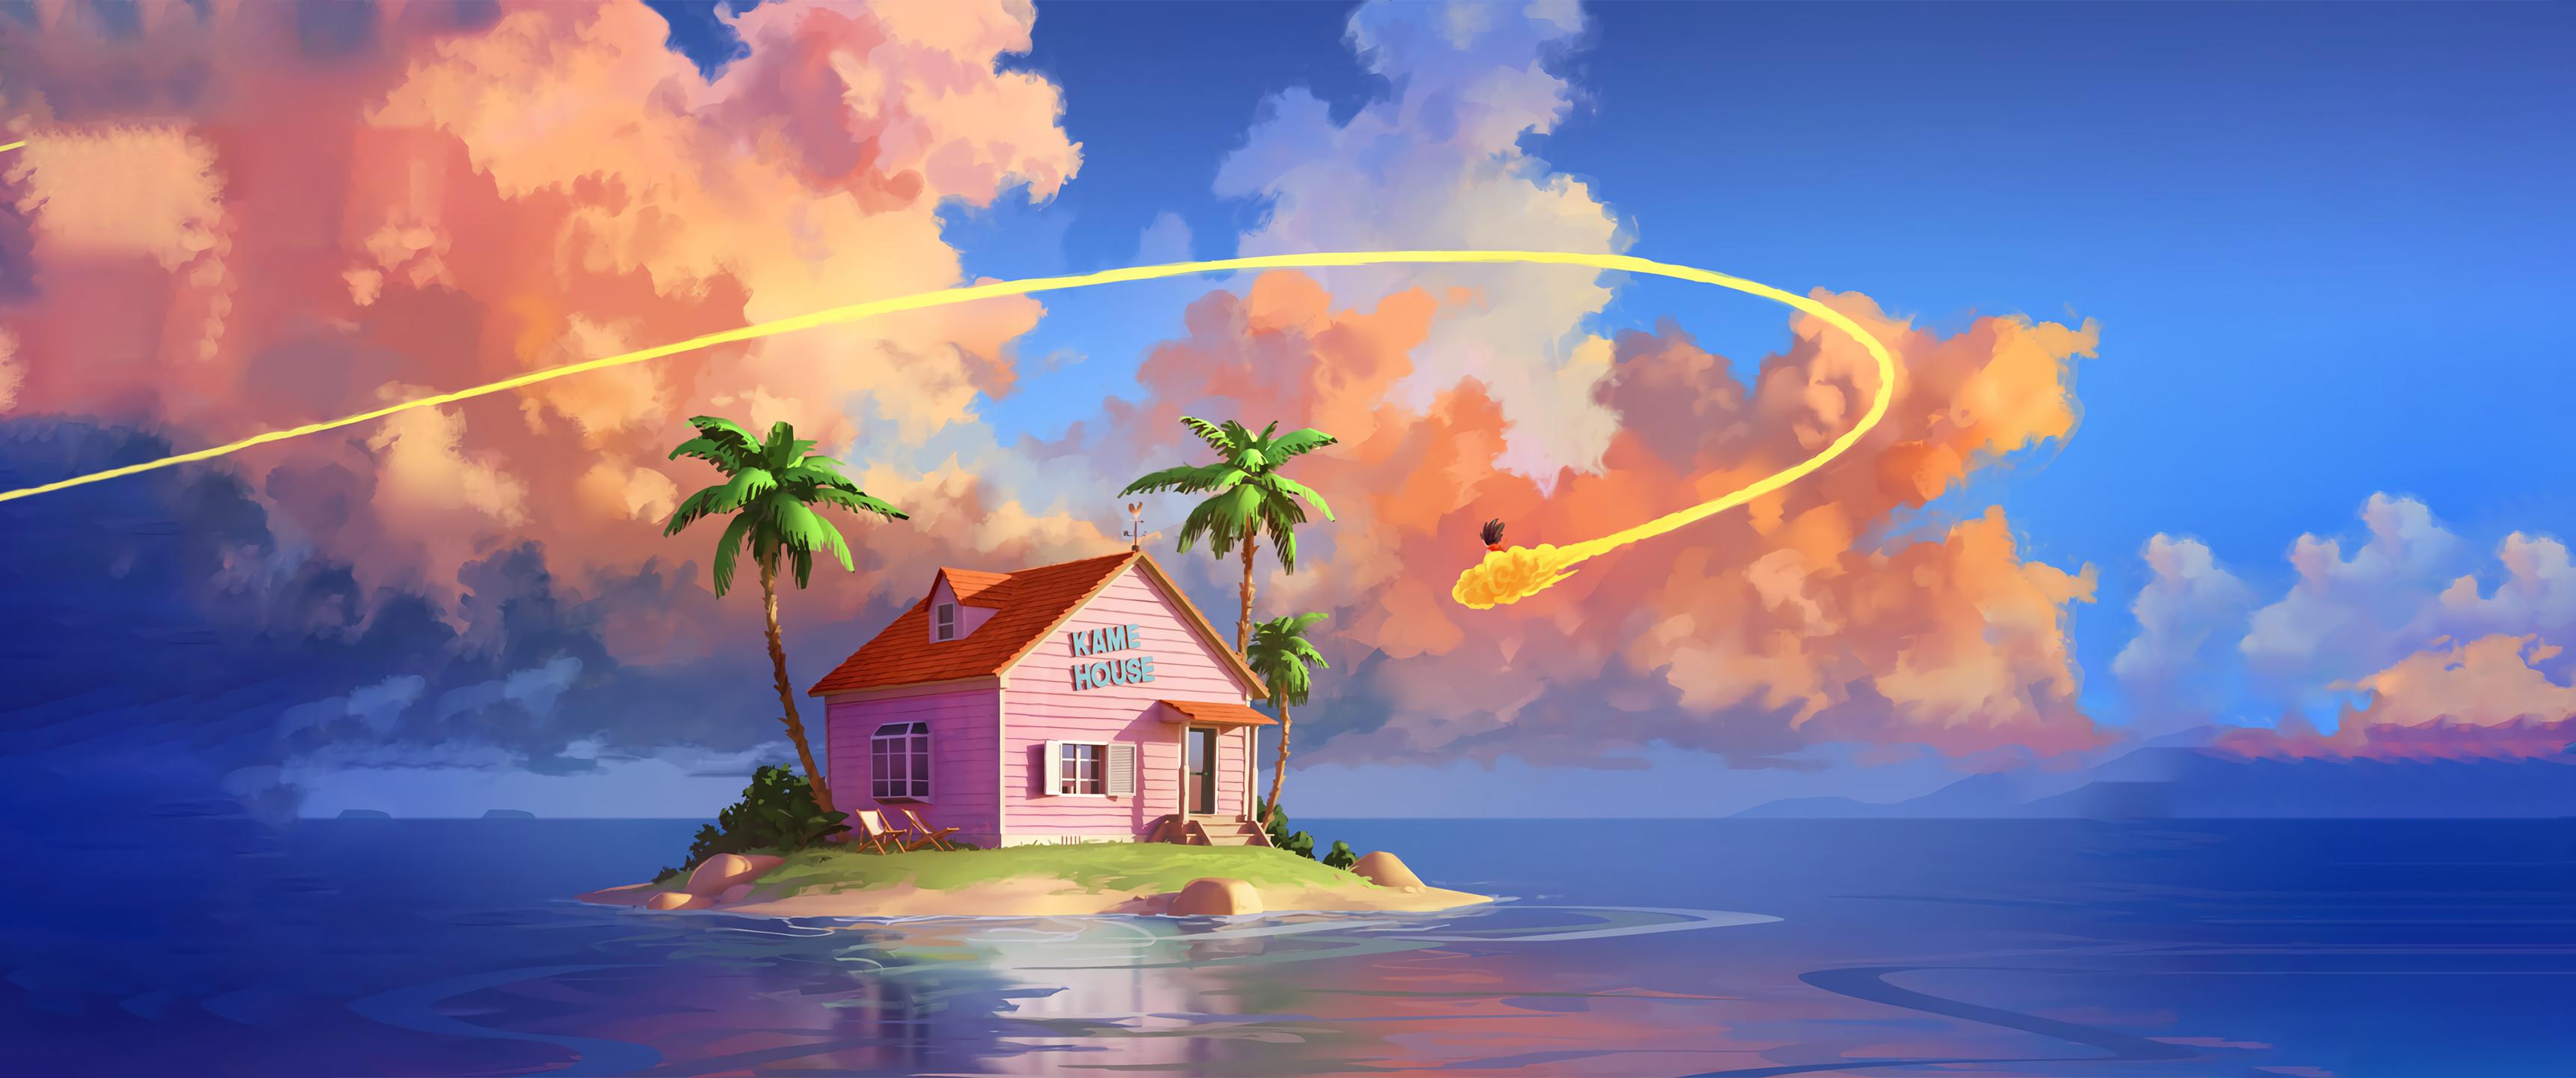 Anime 3440x1440 digital art Son Goku Dragon Ball Dragon Ball Z island ultrawide ultra-wide Sylvain Sarrailh